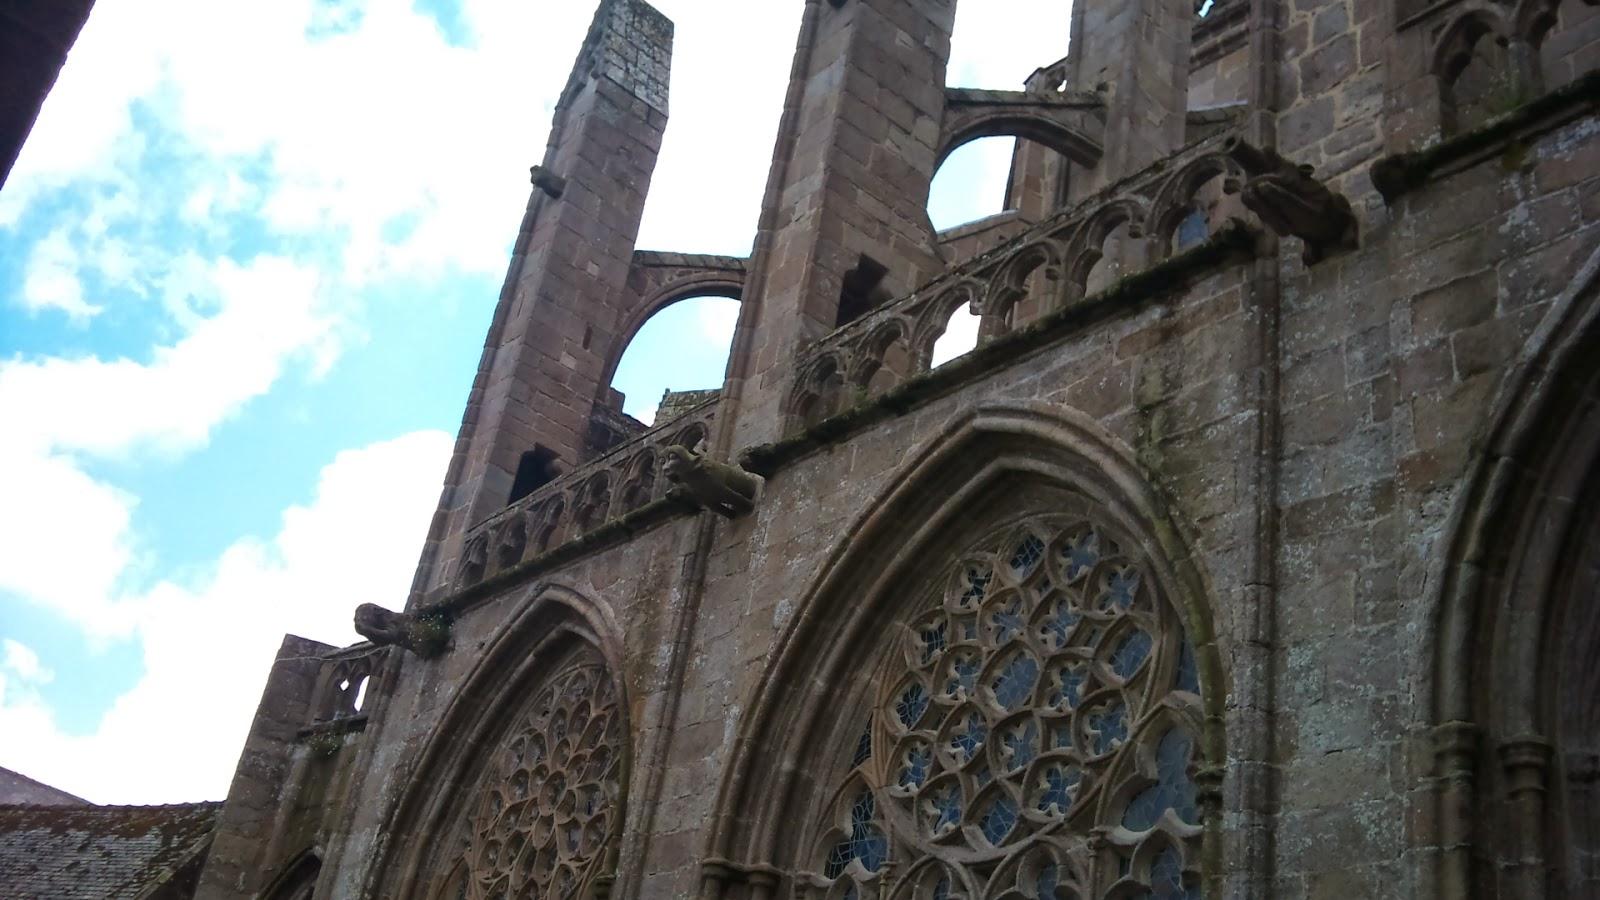 facade extérieure abbaye: vitraux de l'abbaye et gargouilles